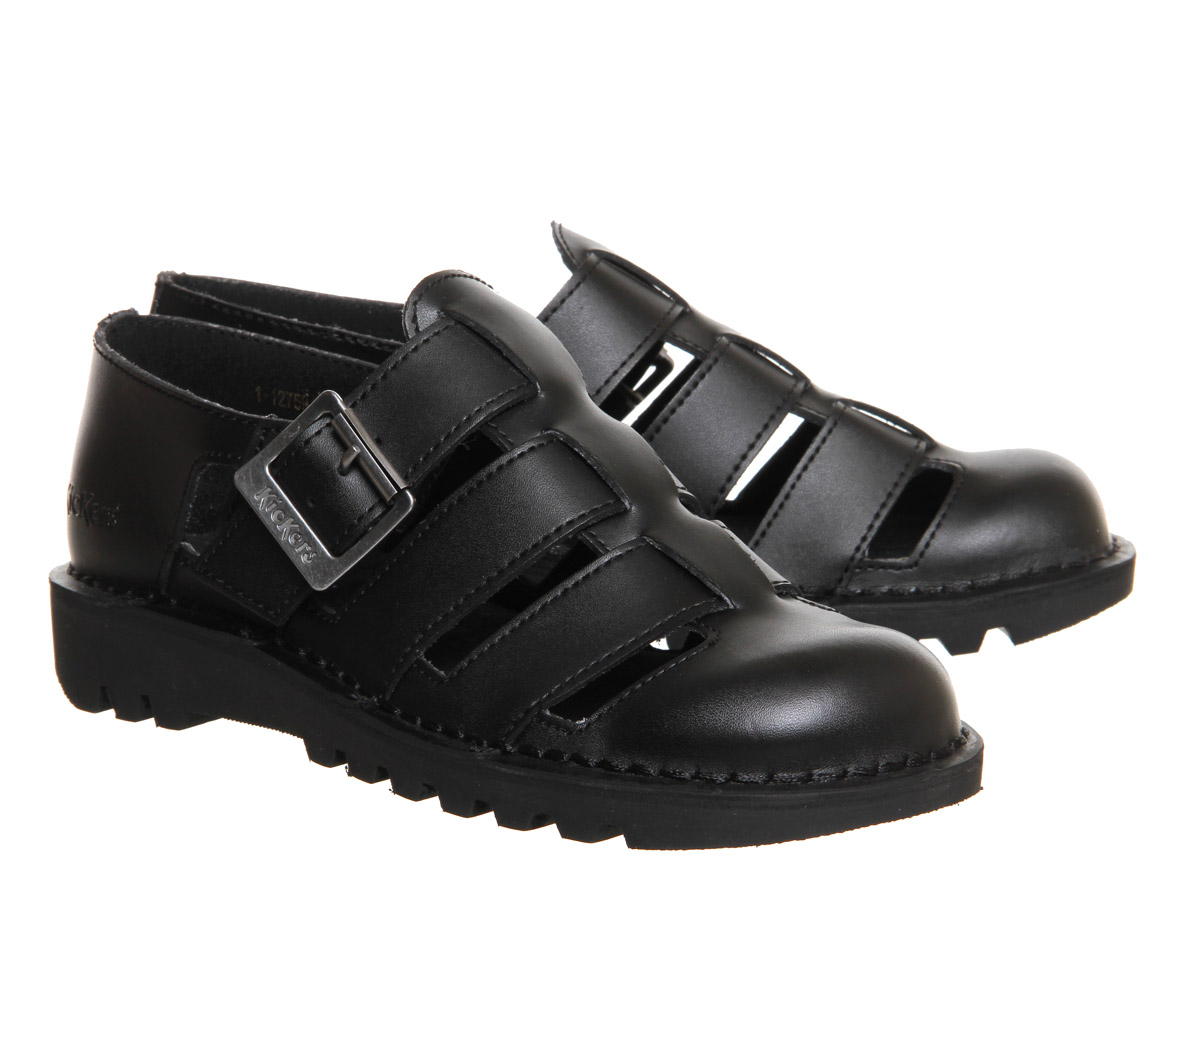 d34ba007a37 Sentinel Womens Kickers Kick Low Weave Black Leather Flats